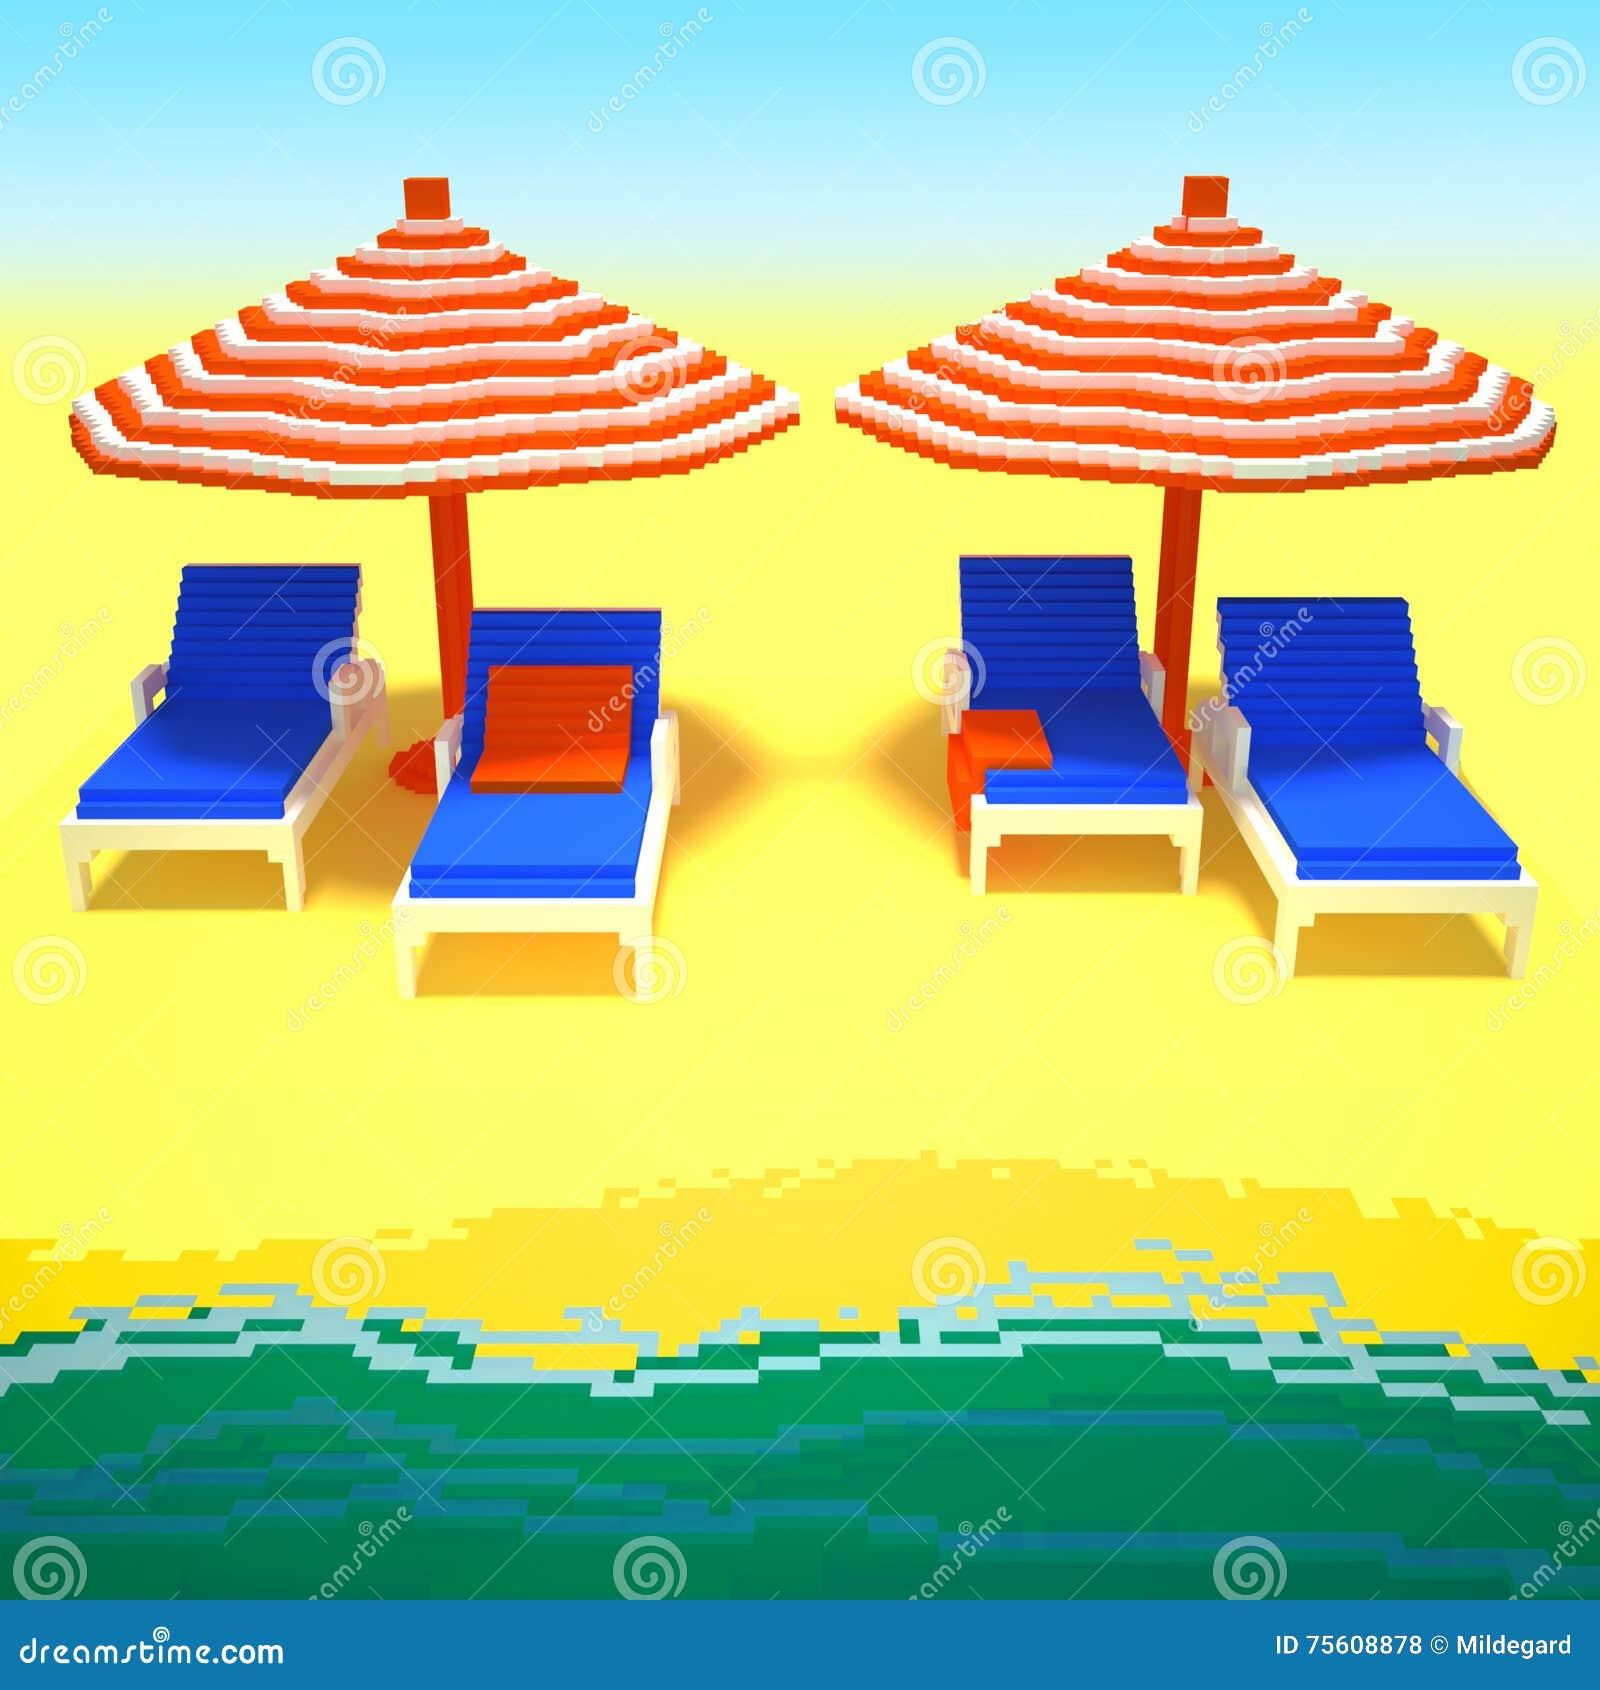 Summer vacation 3d art